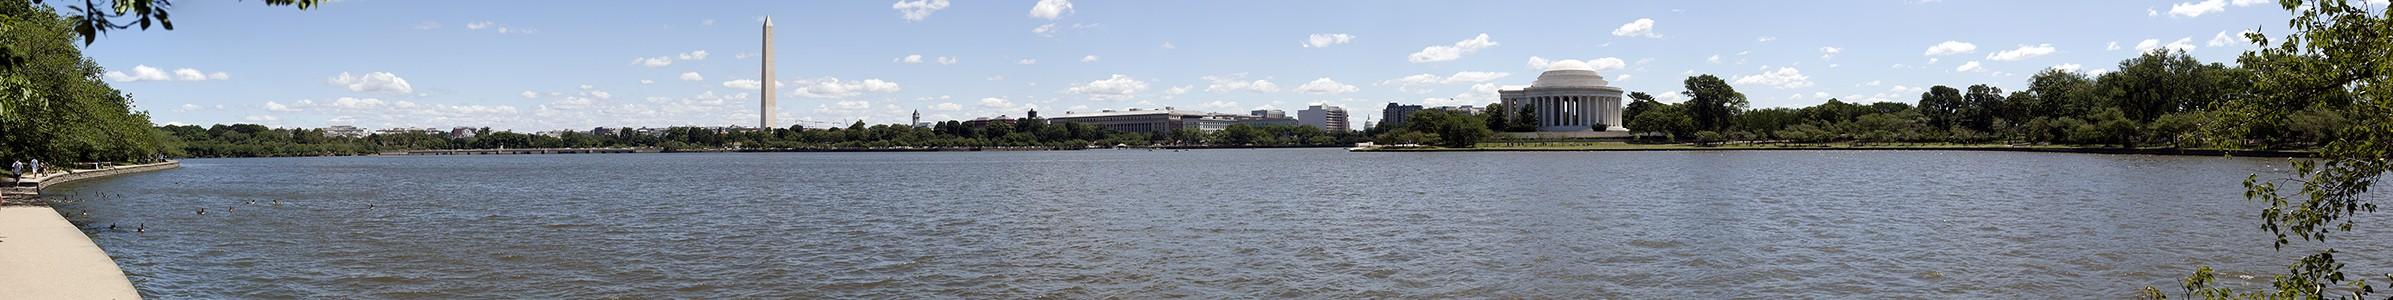 West Potomac Park: Tidal Basin, Washington Monument, Jefferson Memorial Washington, D.C.